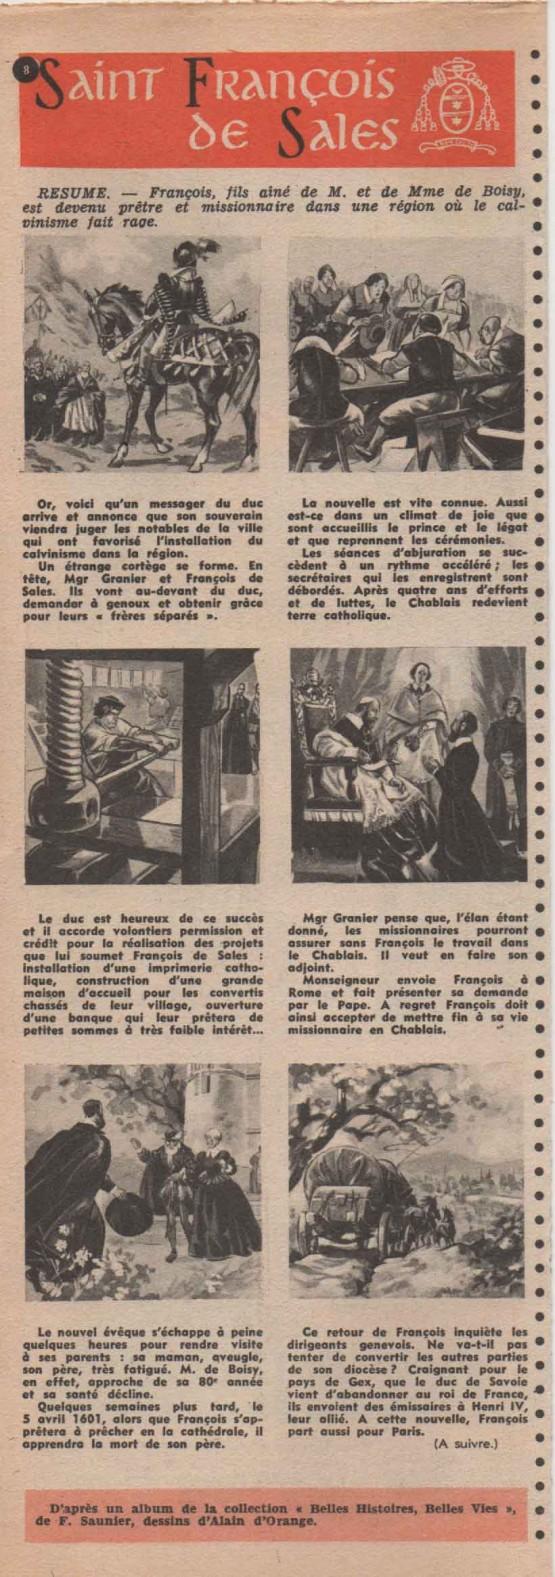 Belles histoires, belles vies n° 15 : «  Charles de Foucault » (1953).